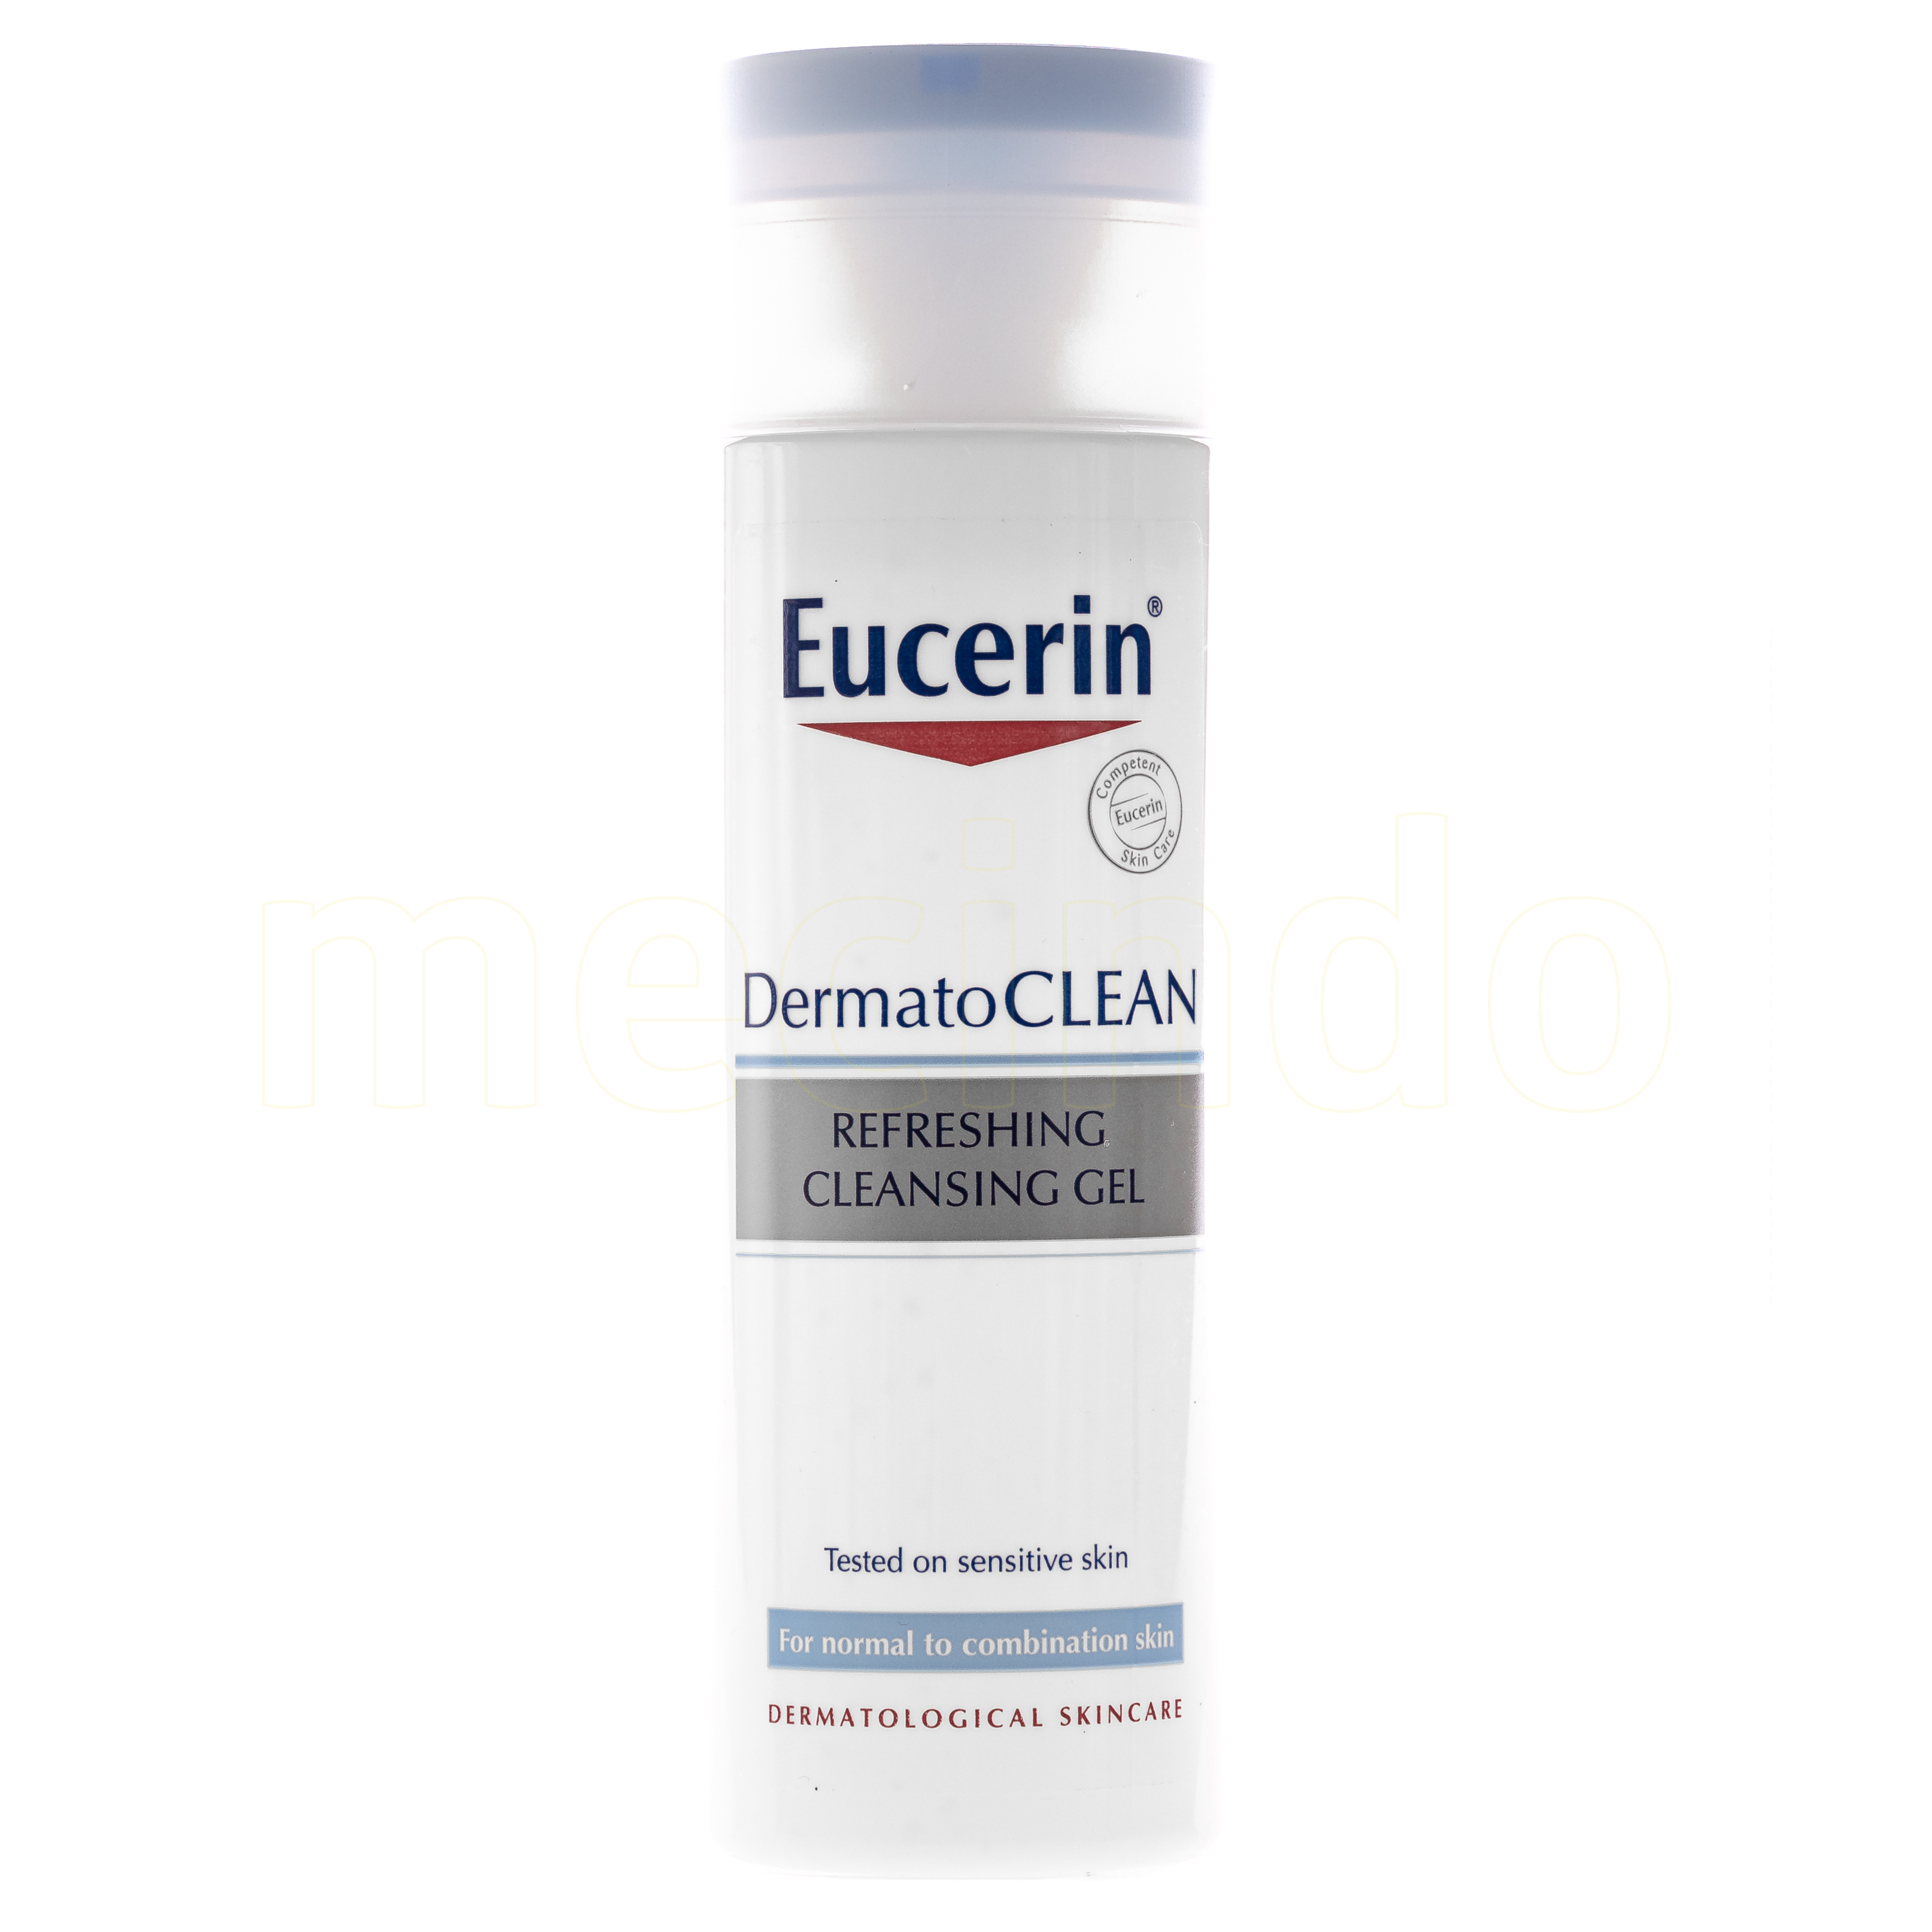 Eucerin Dermatoclean Cleansing Gel - 200 ml